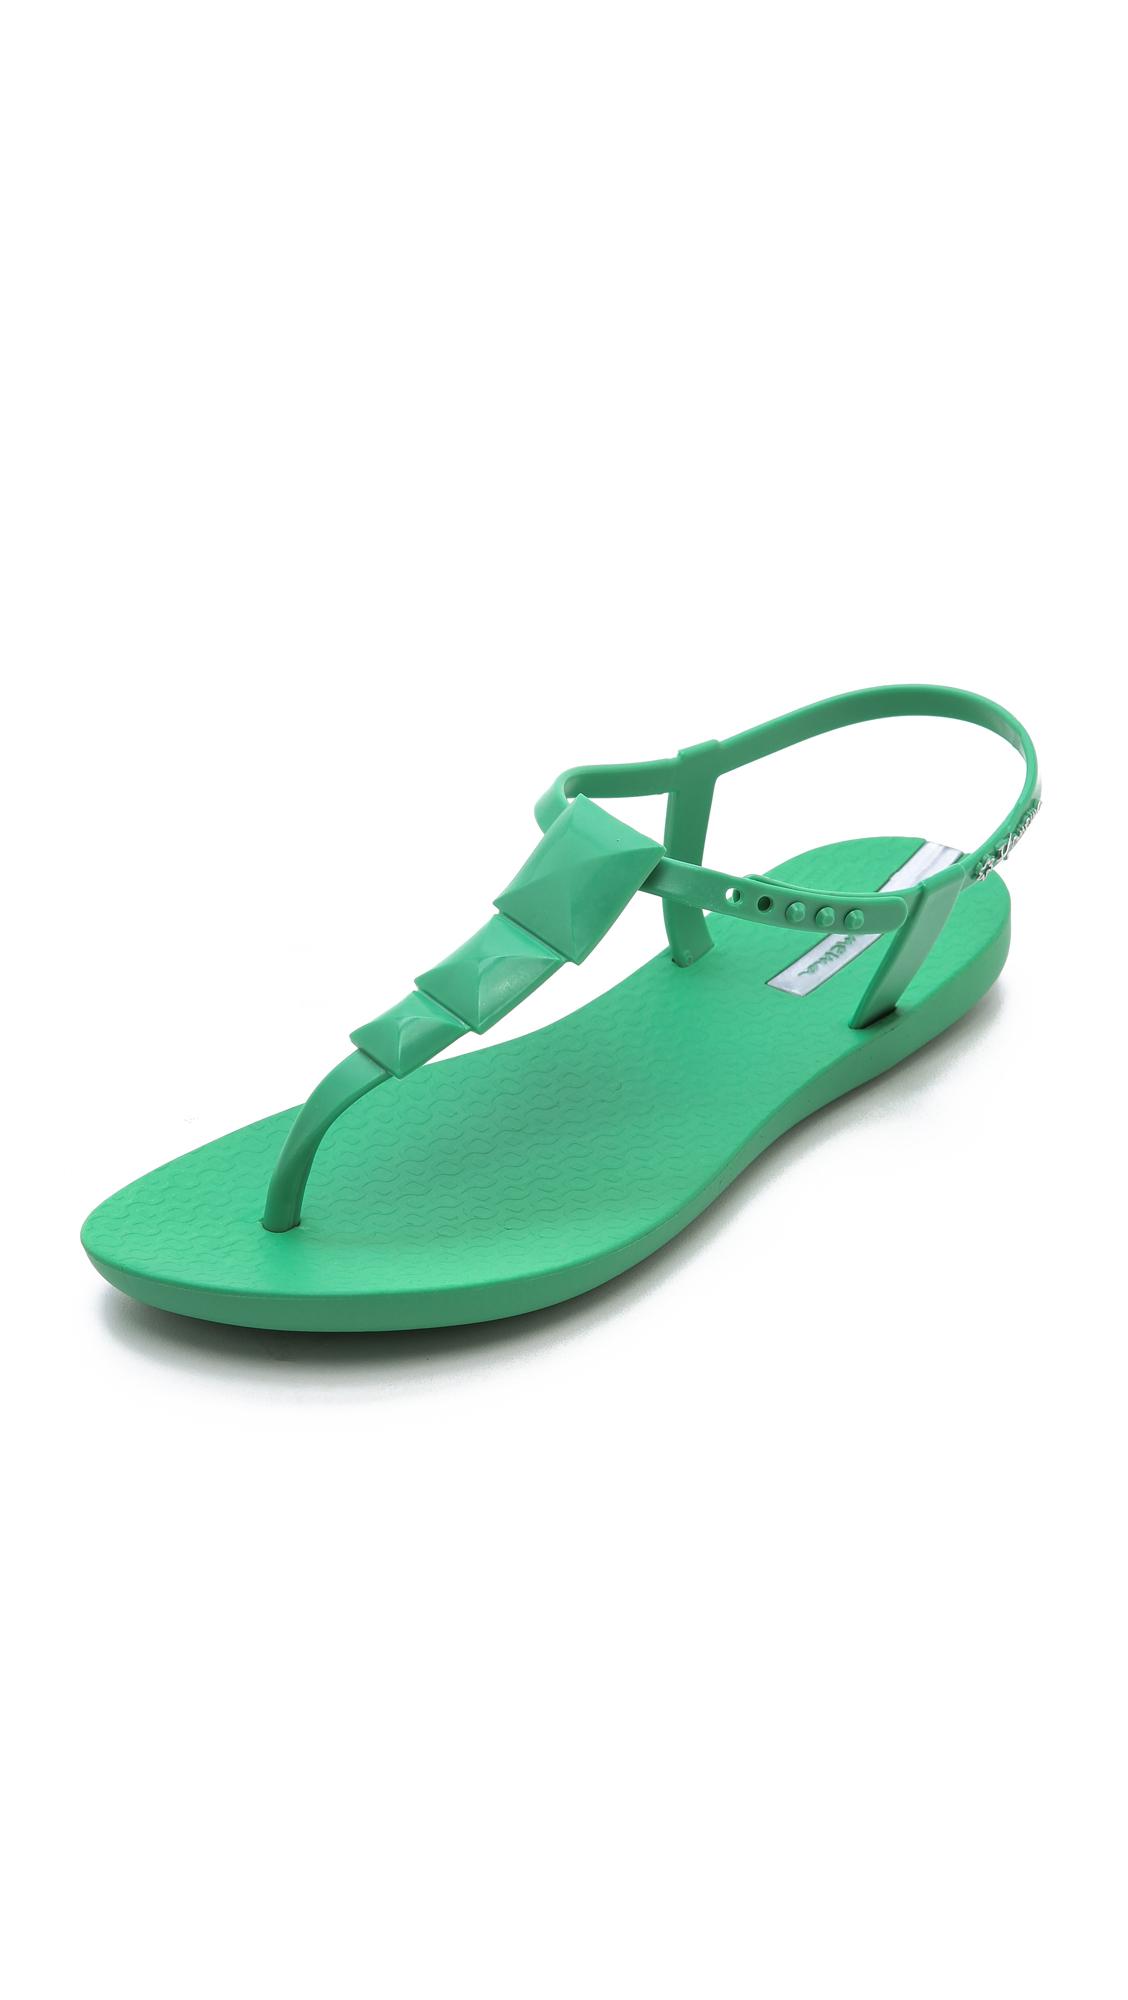 4a4014e2cafbfe Ipanema Maya Studded Sandals